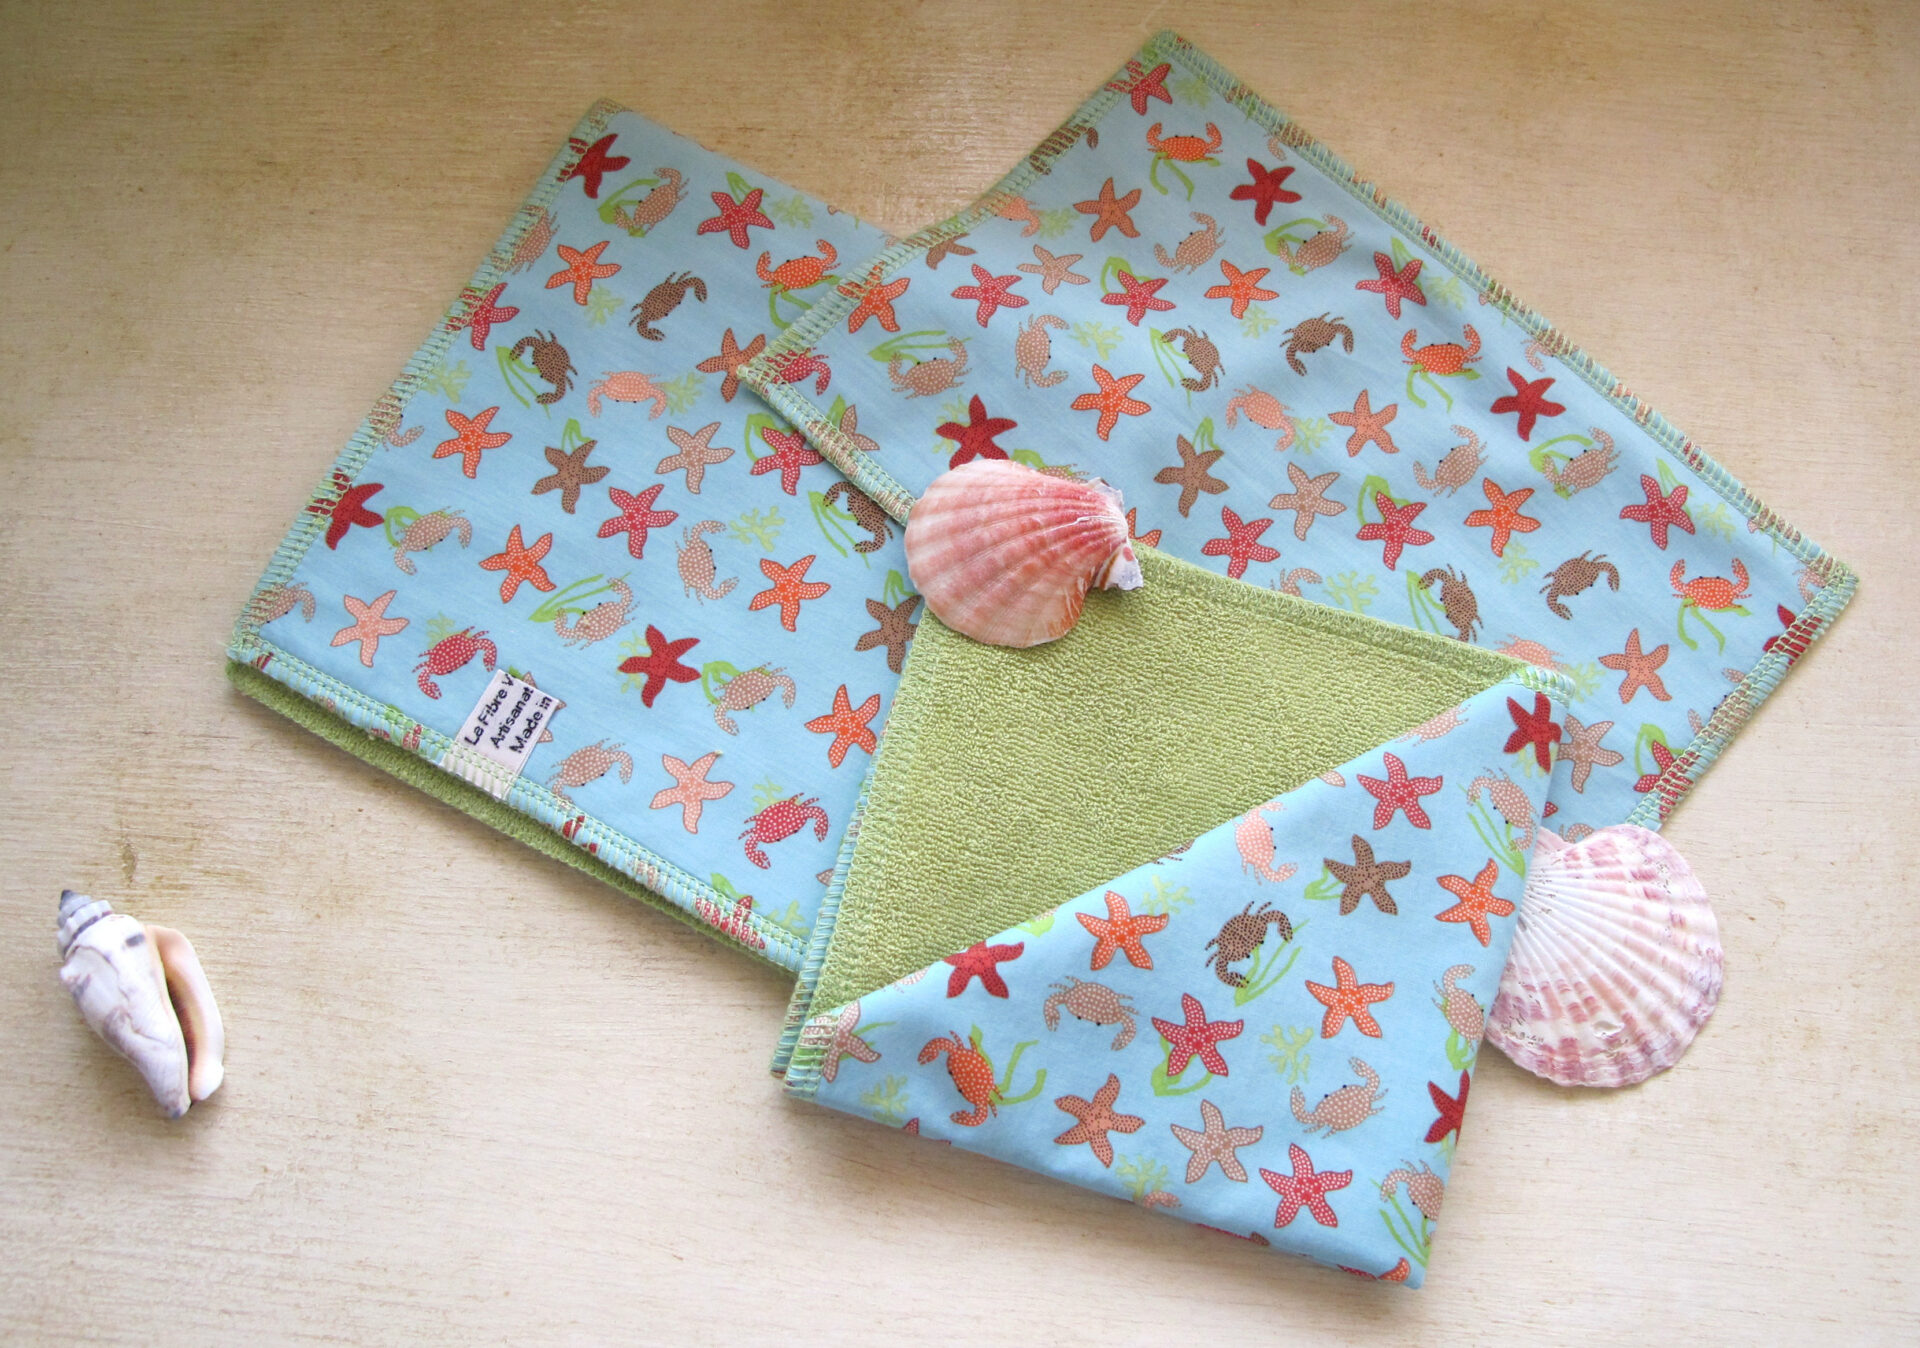 Creations textiles artisanales